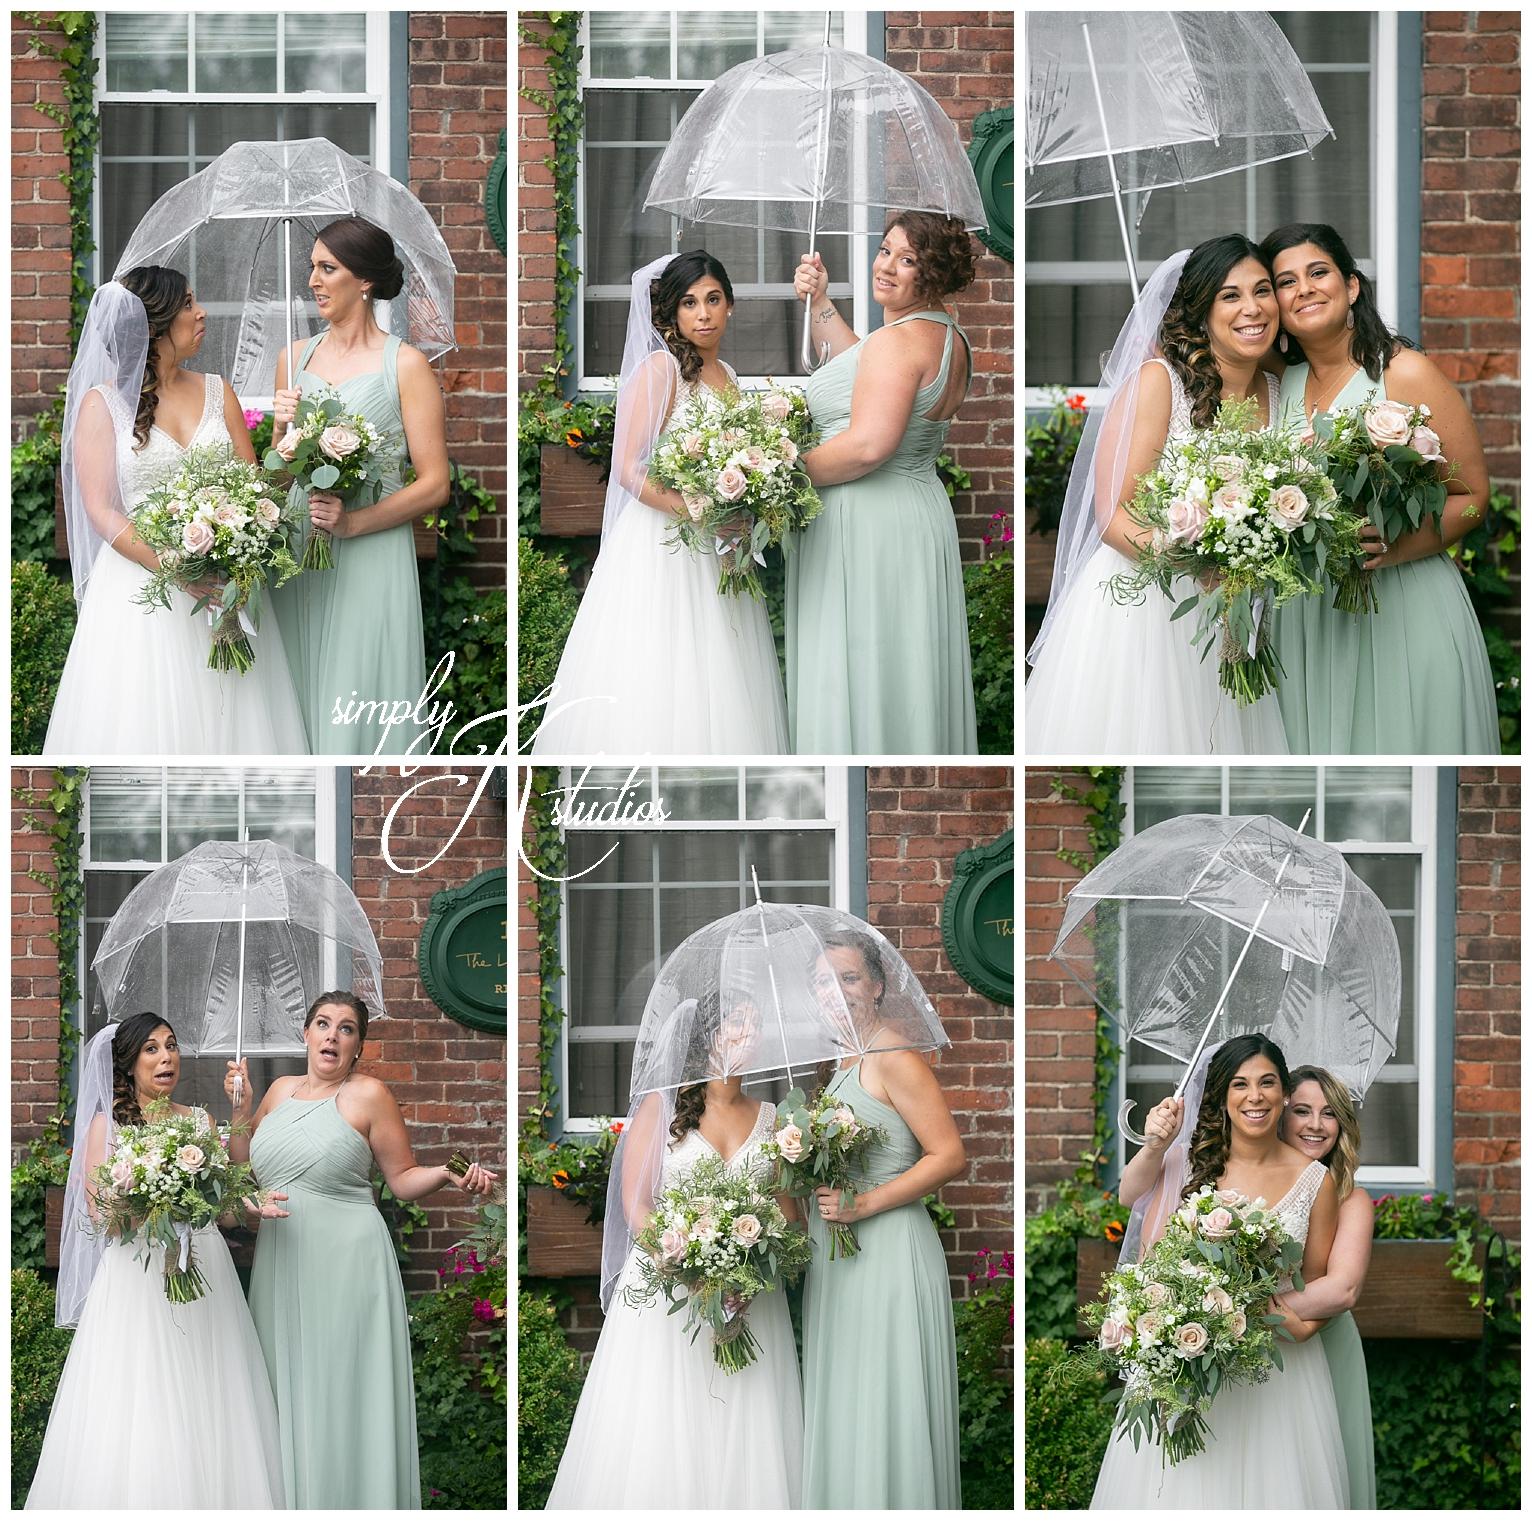 Bridesmaid Dresses.jpg